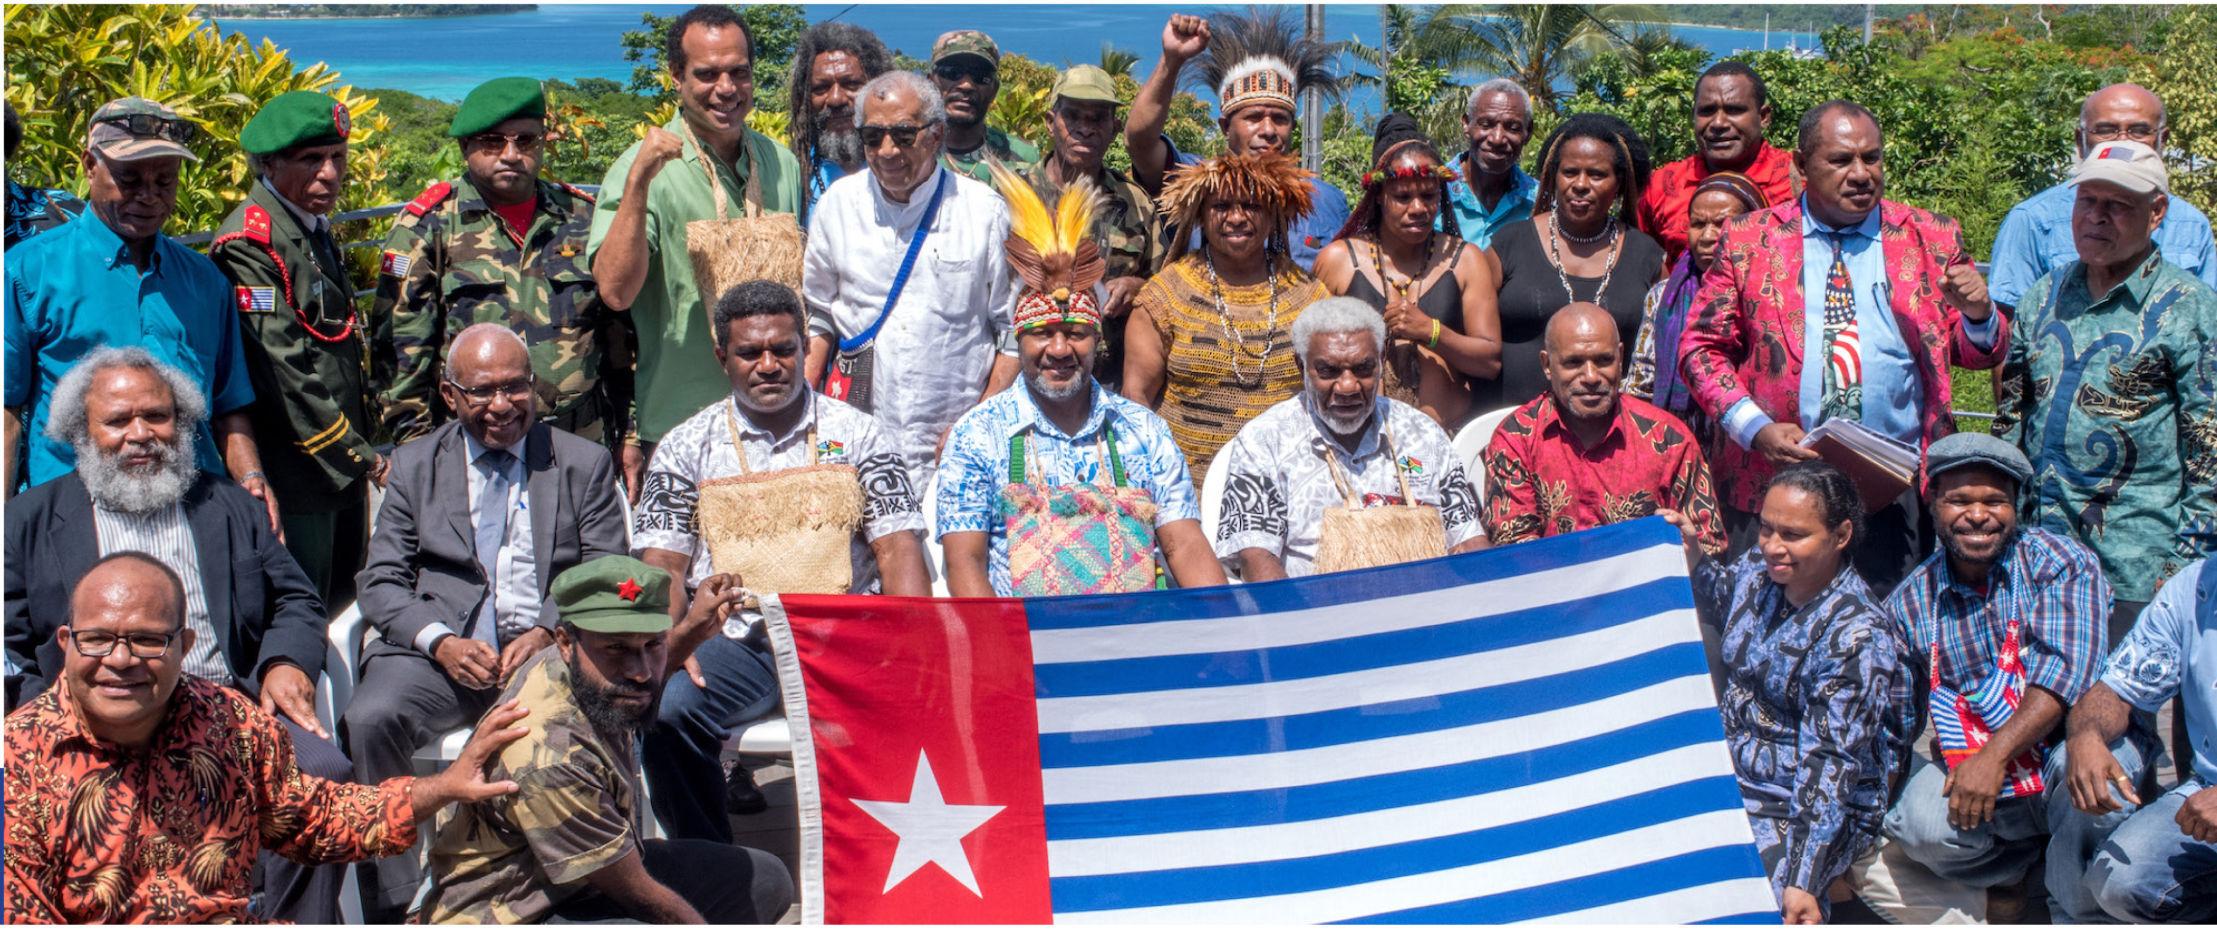 Indonesia is losing Melanesia